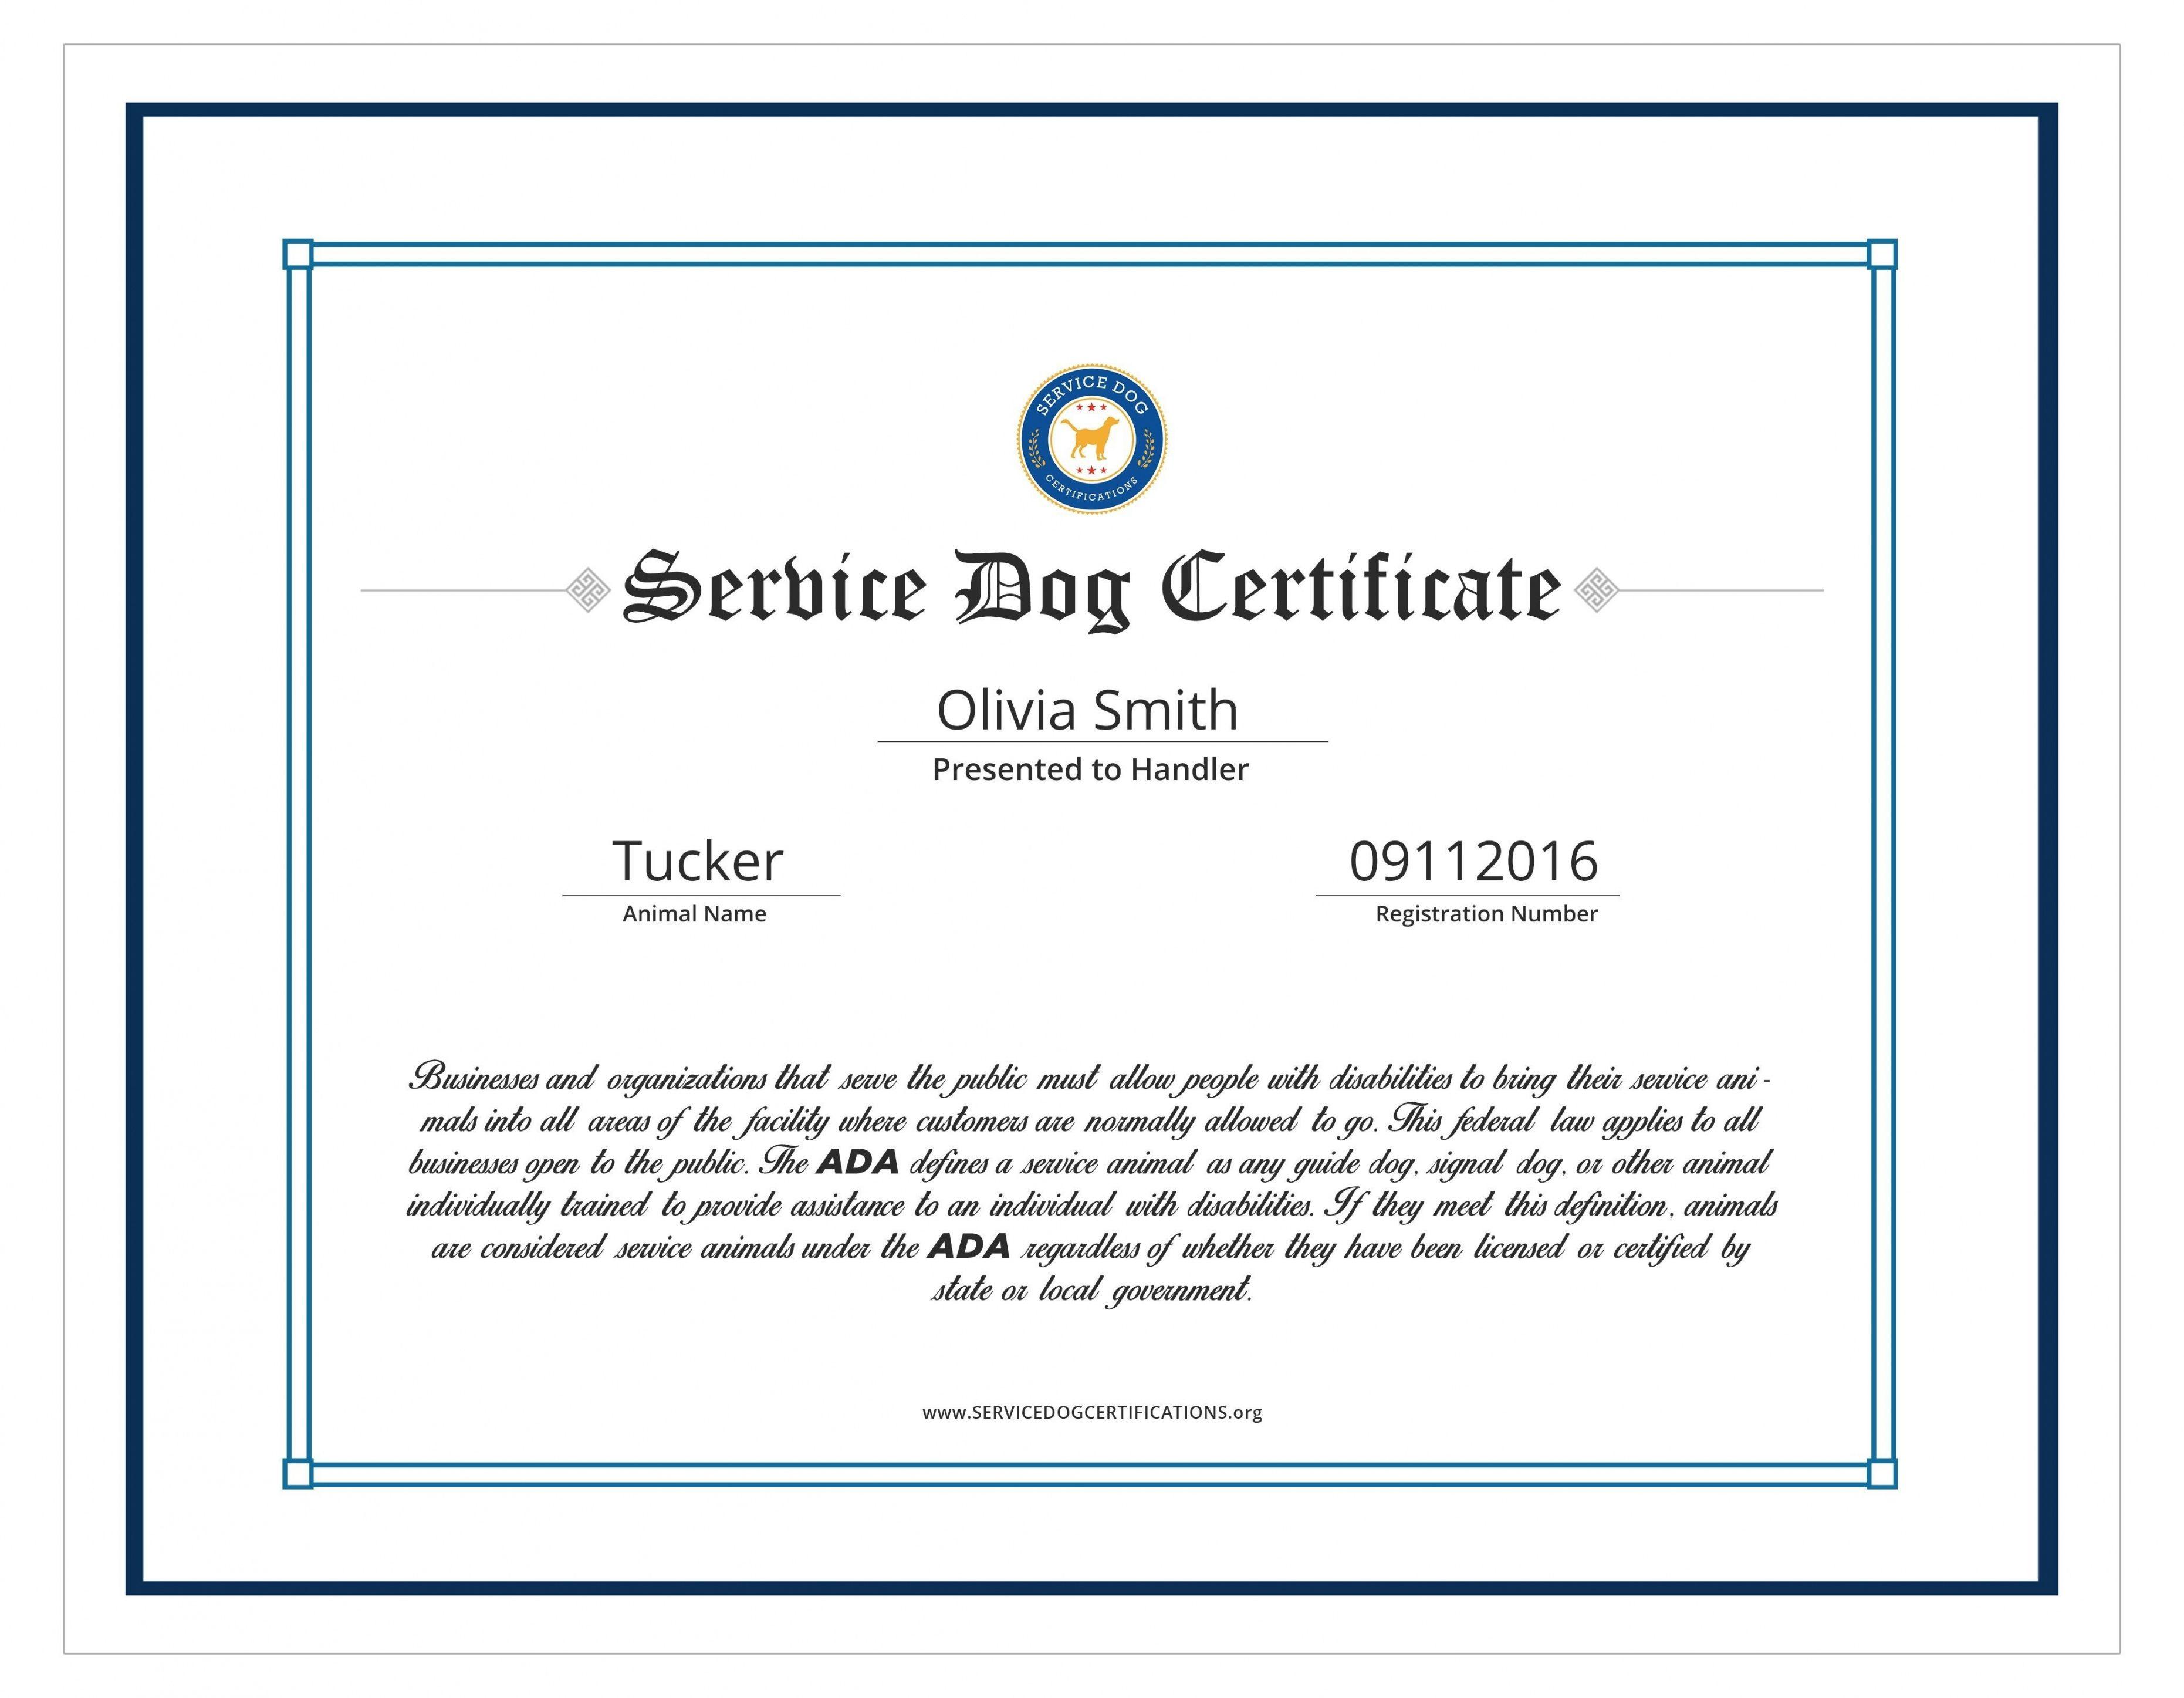 certificate for certificate template ccna certification